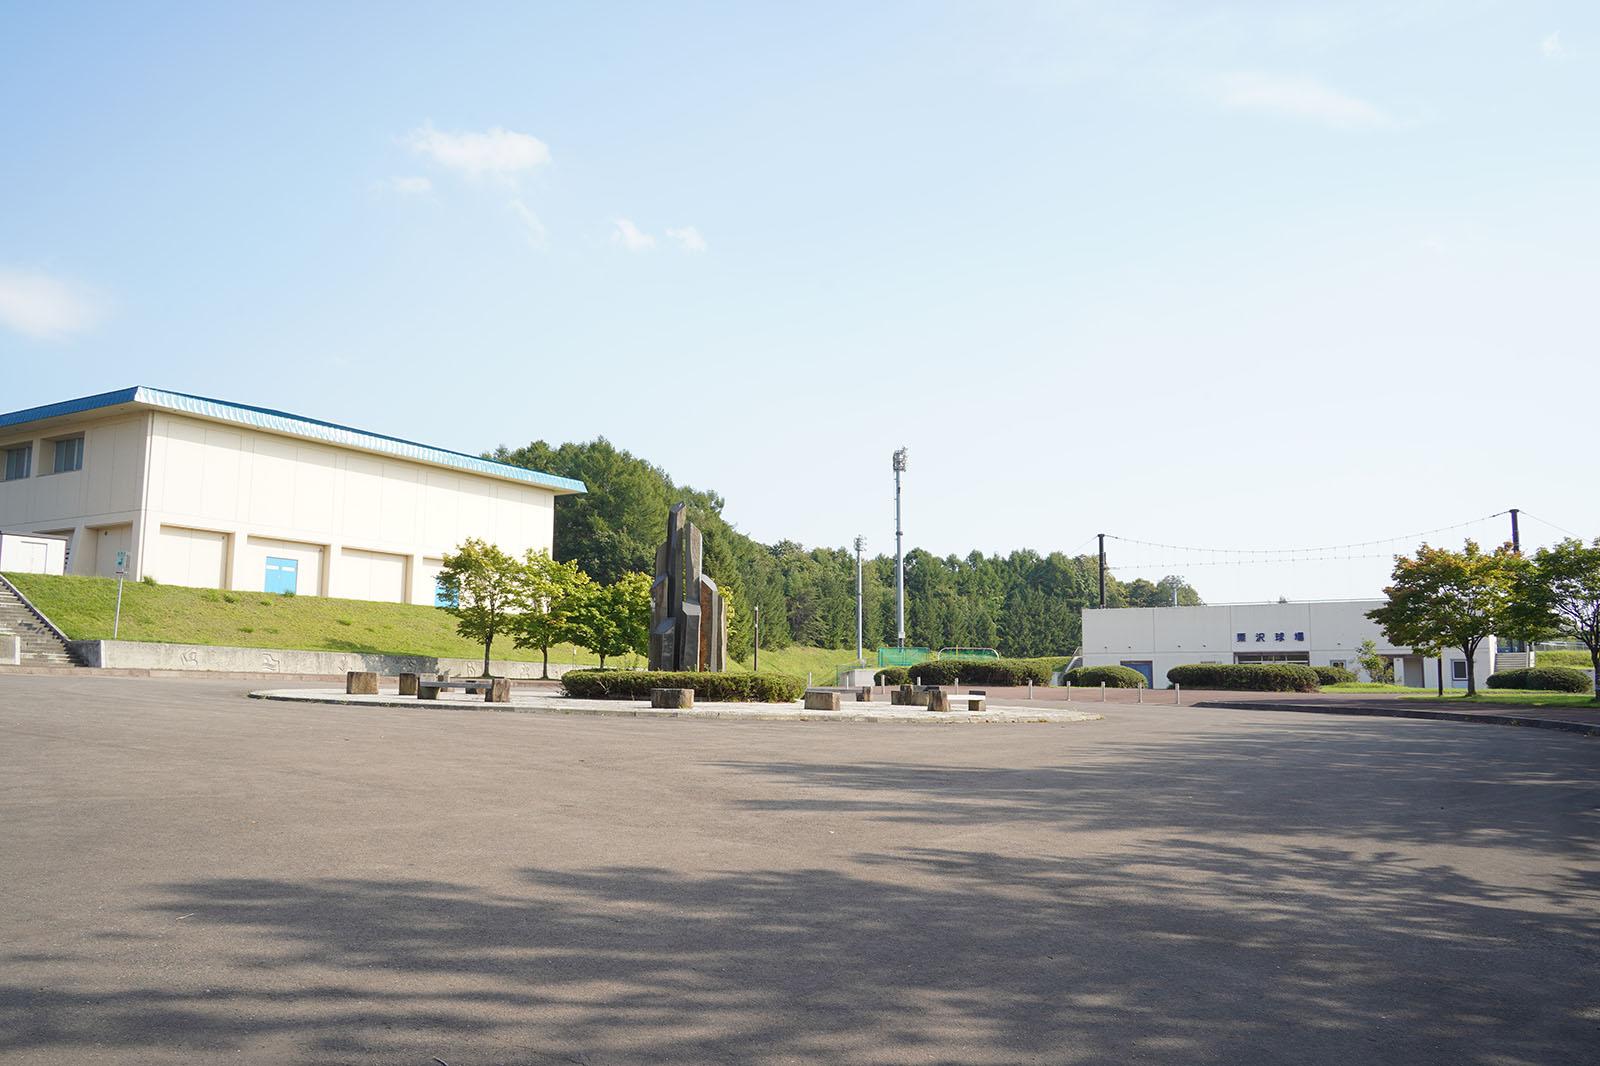 岩見沢市栗沢スポーツ公園